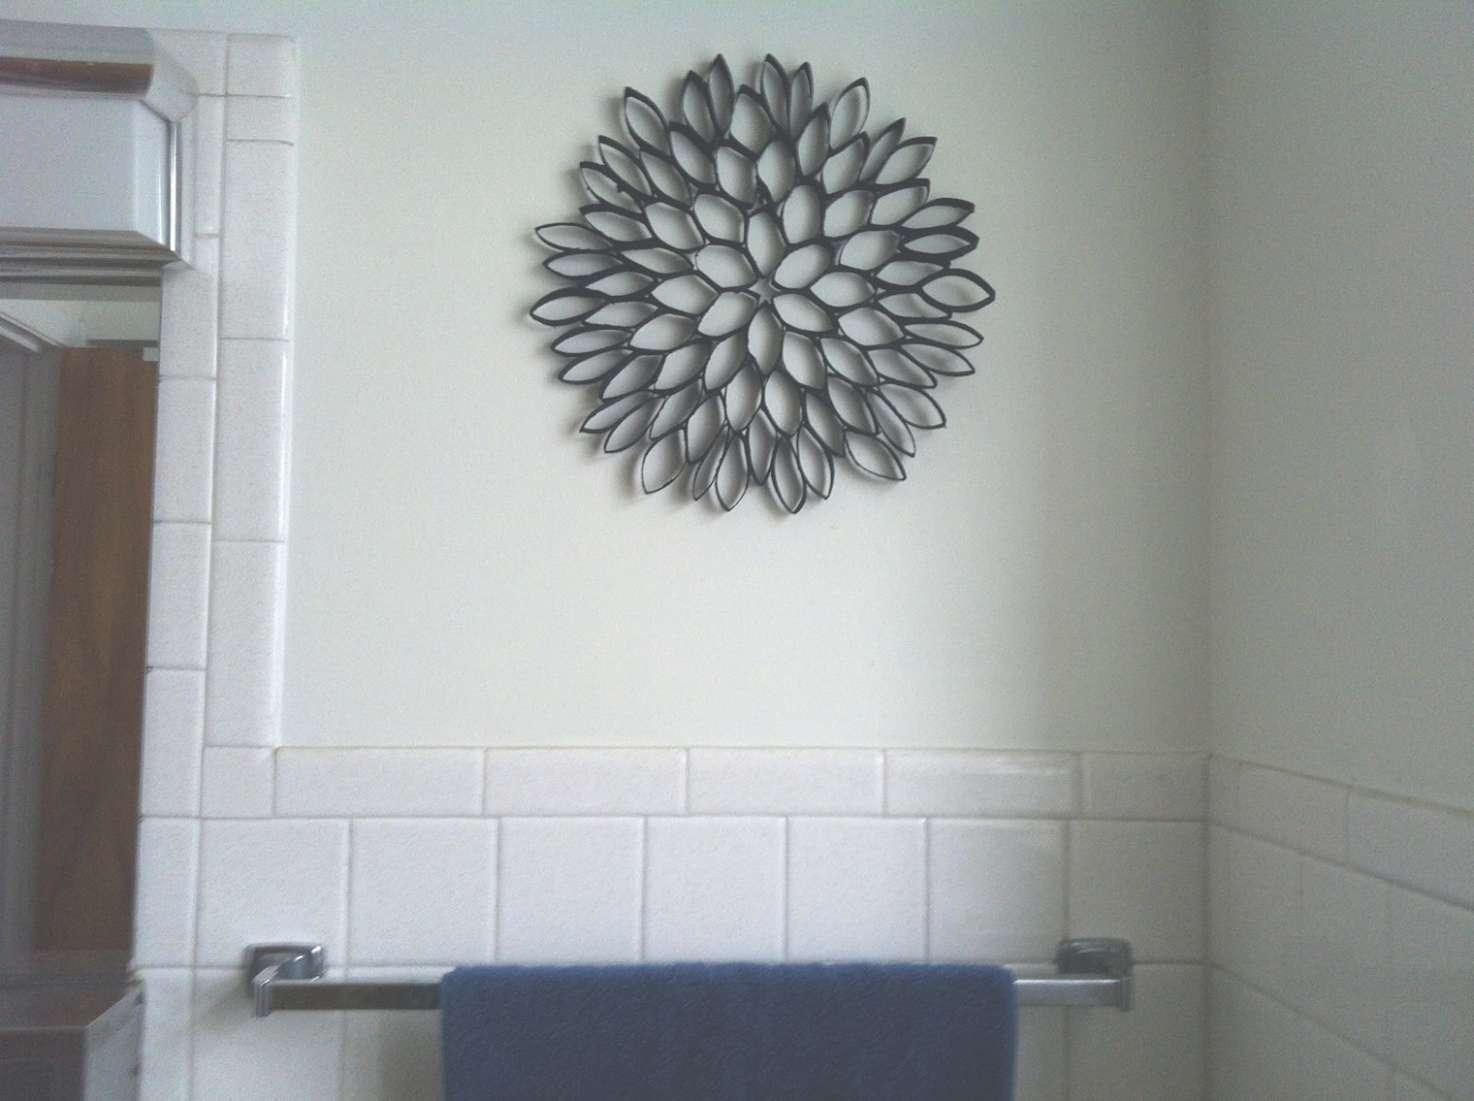 Toilet Paper Roll Wall Ar Best Toilet Paper Roll Wall Art – Prix Inside Most Popular Toilet Paper Roll Wall Art (View 8 of 20)